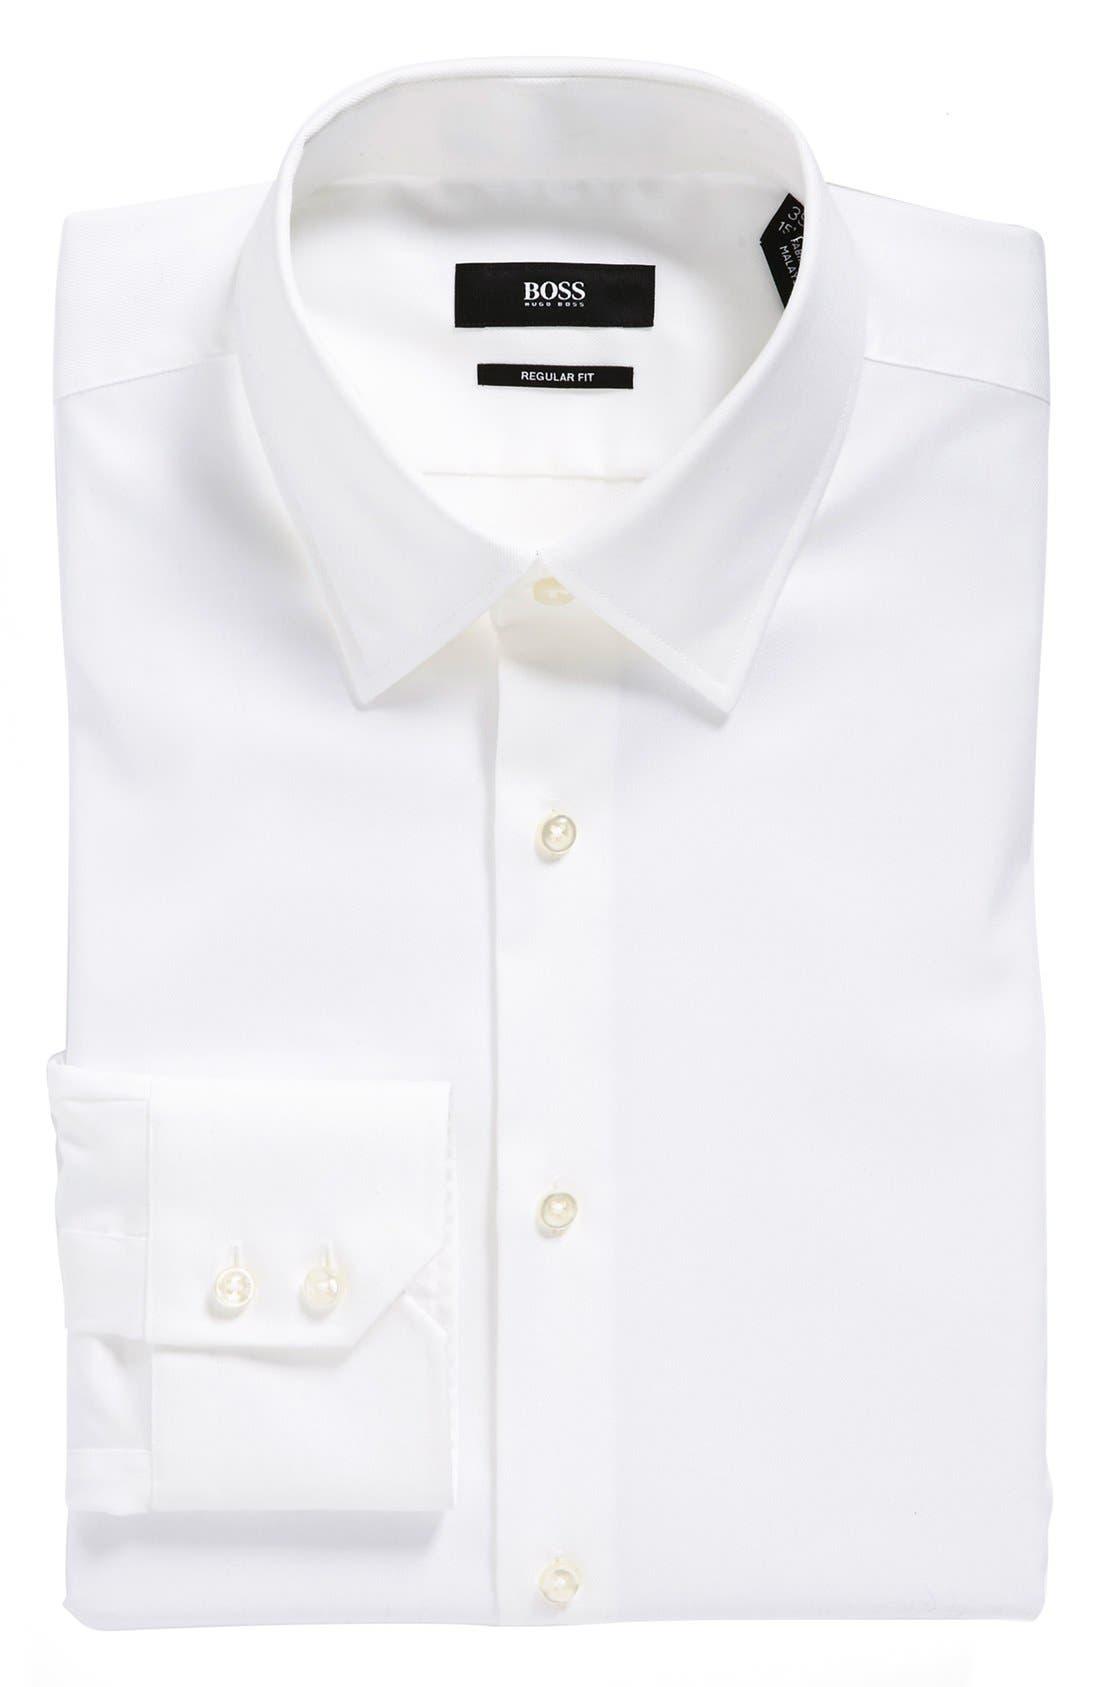 Main Image - BOSS HUGO BOSS 'Enzo' WW Regular Fit Easy Iron Dress Shirt